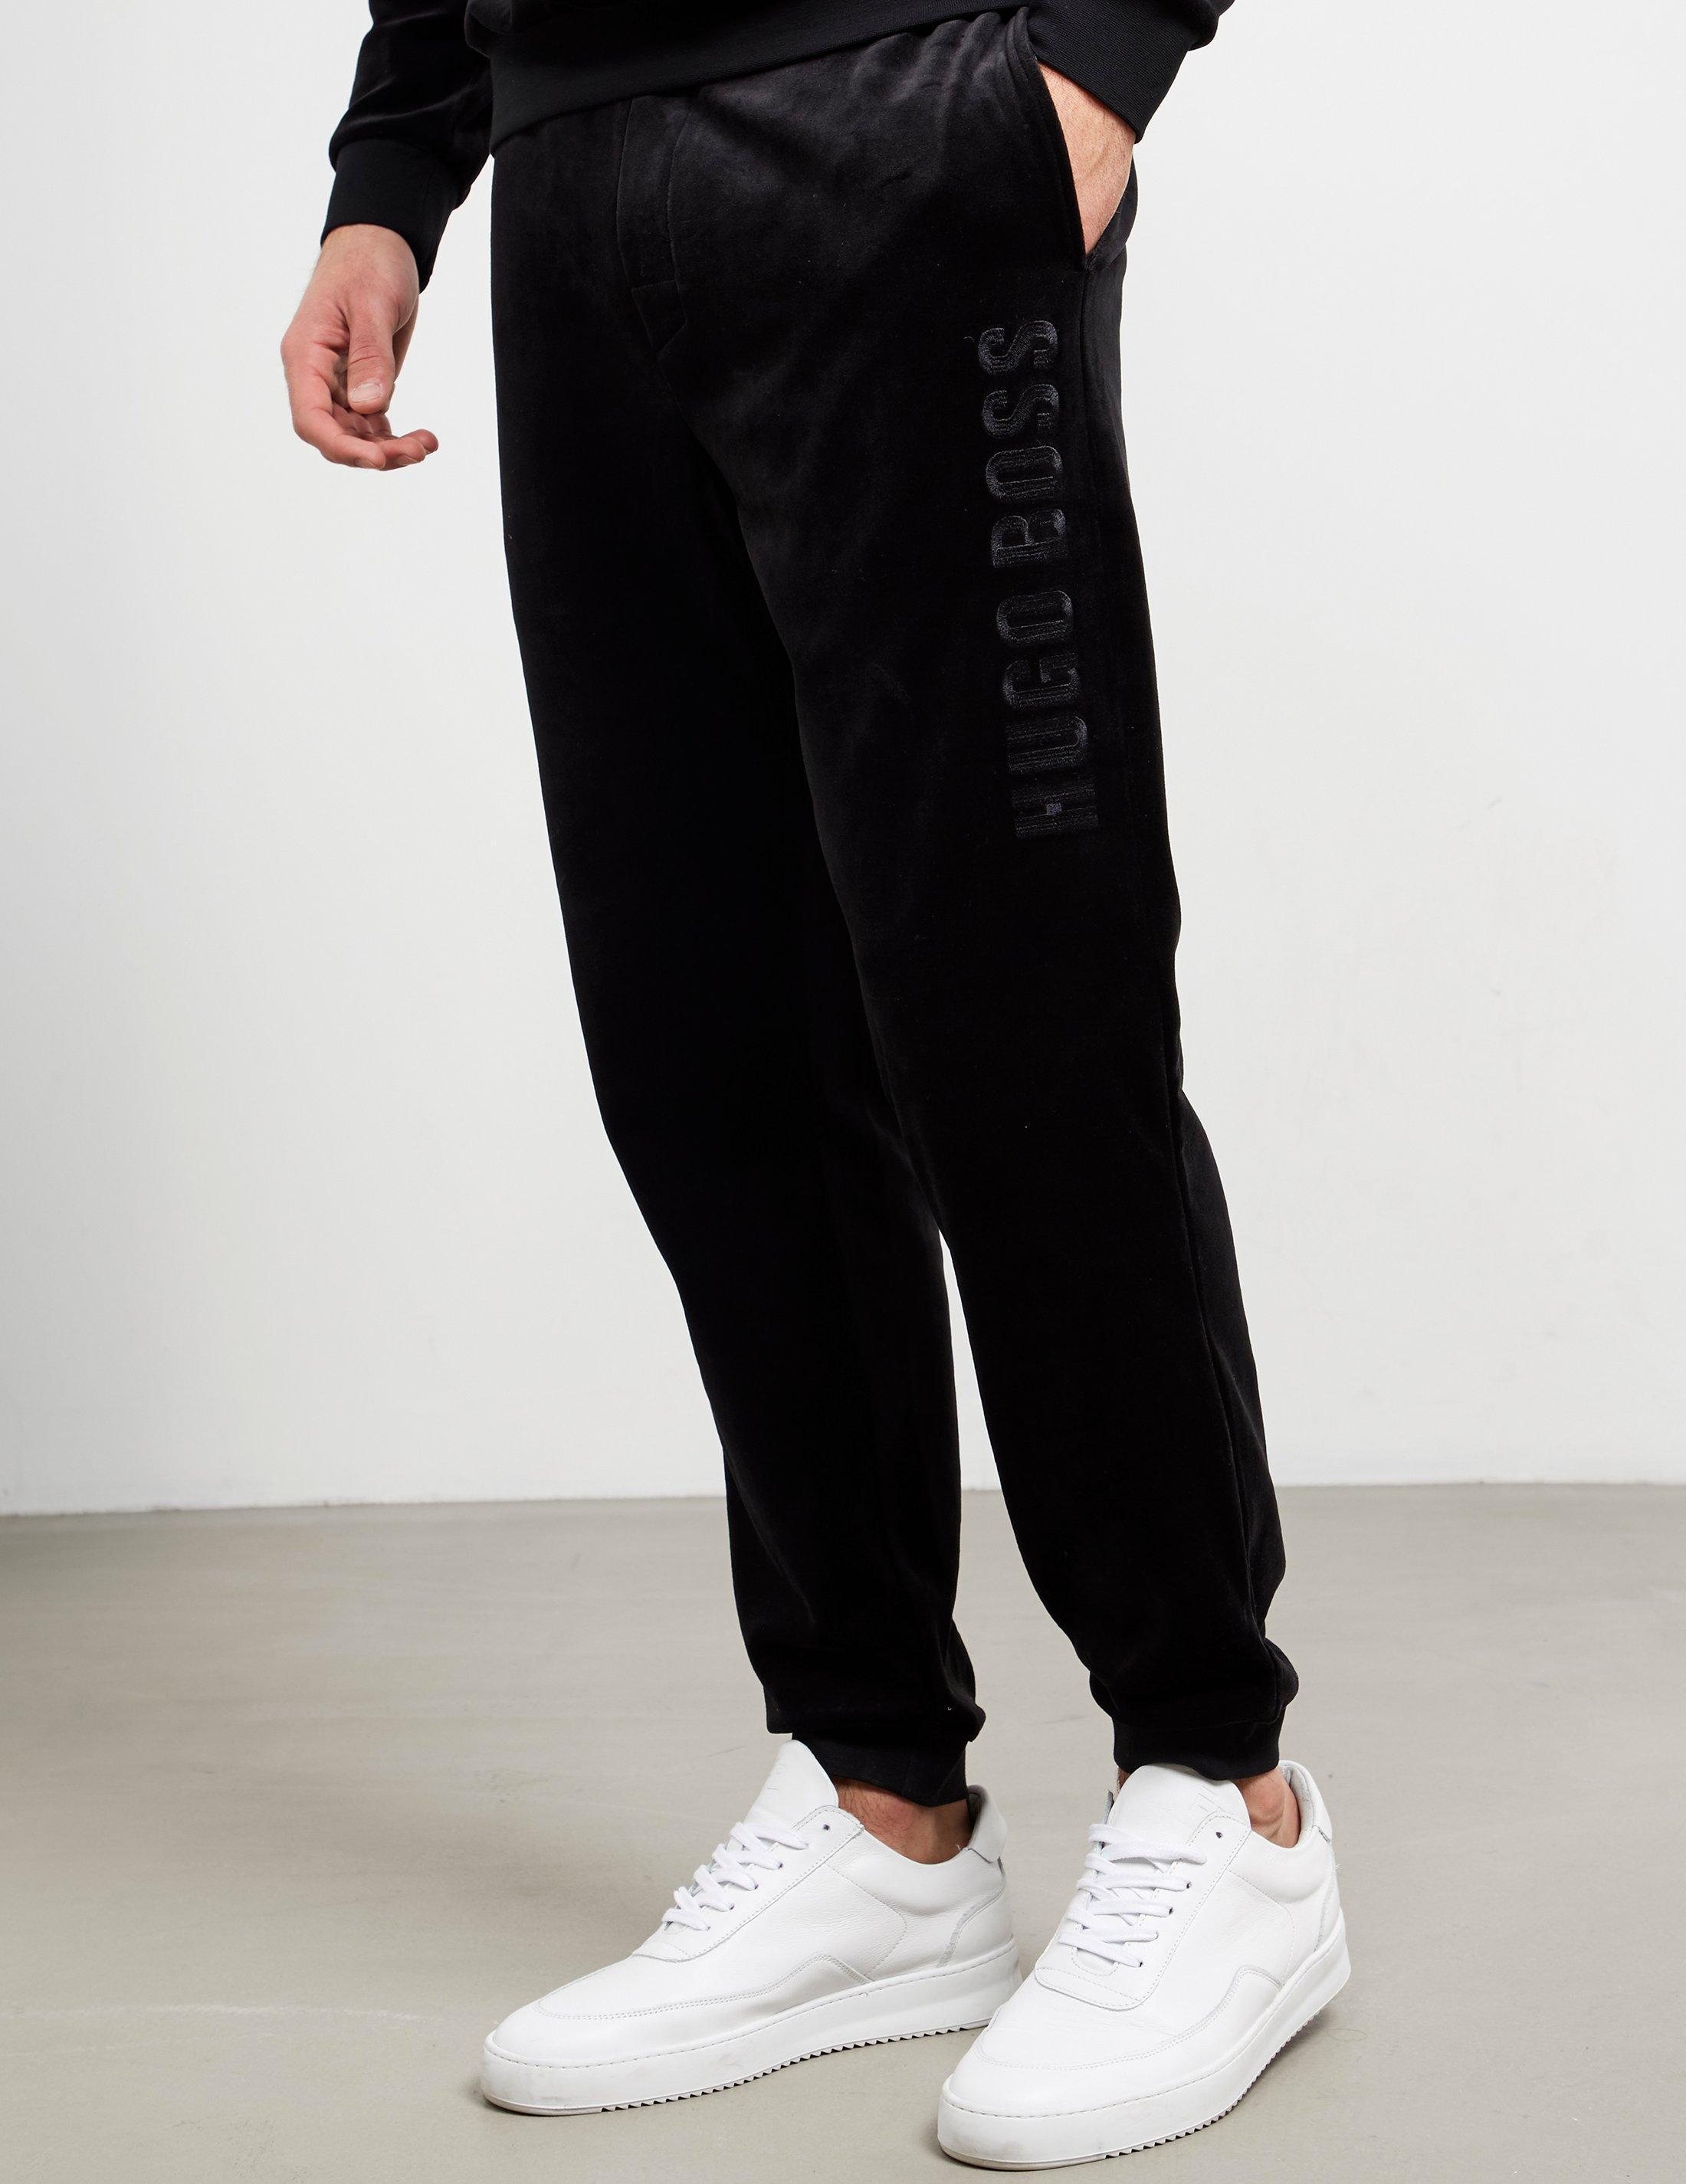 Hugo Boss Men/'s Velour Cuffed Hem Pants